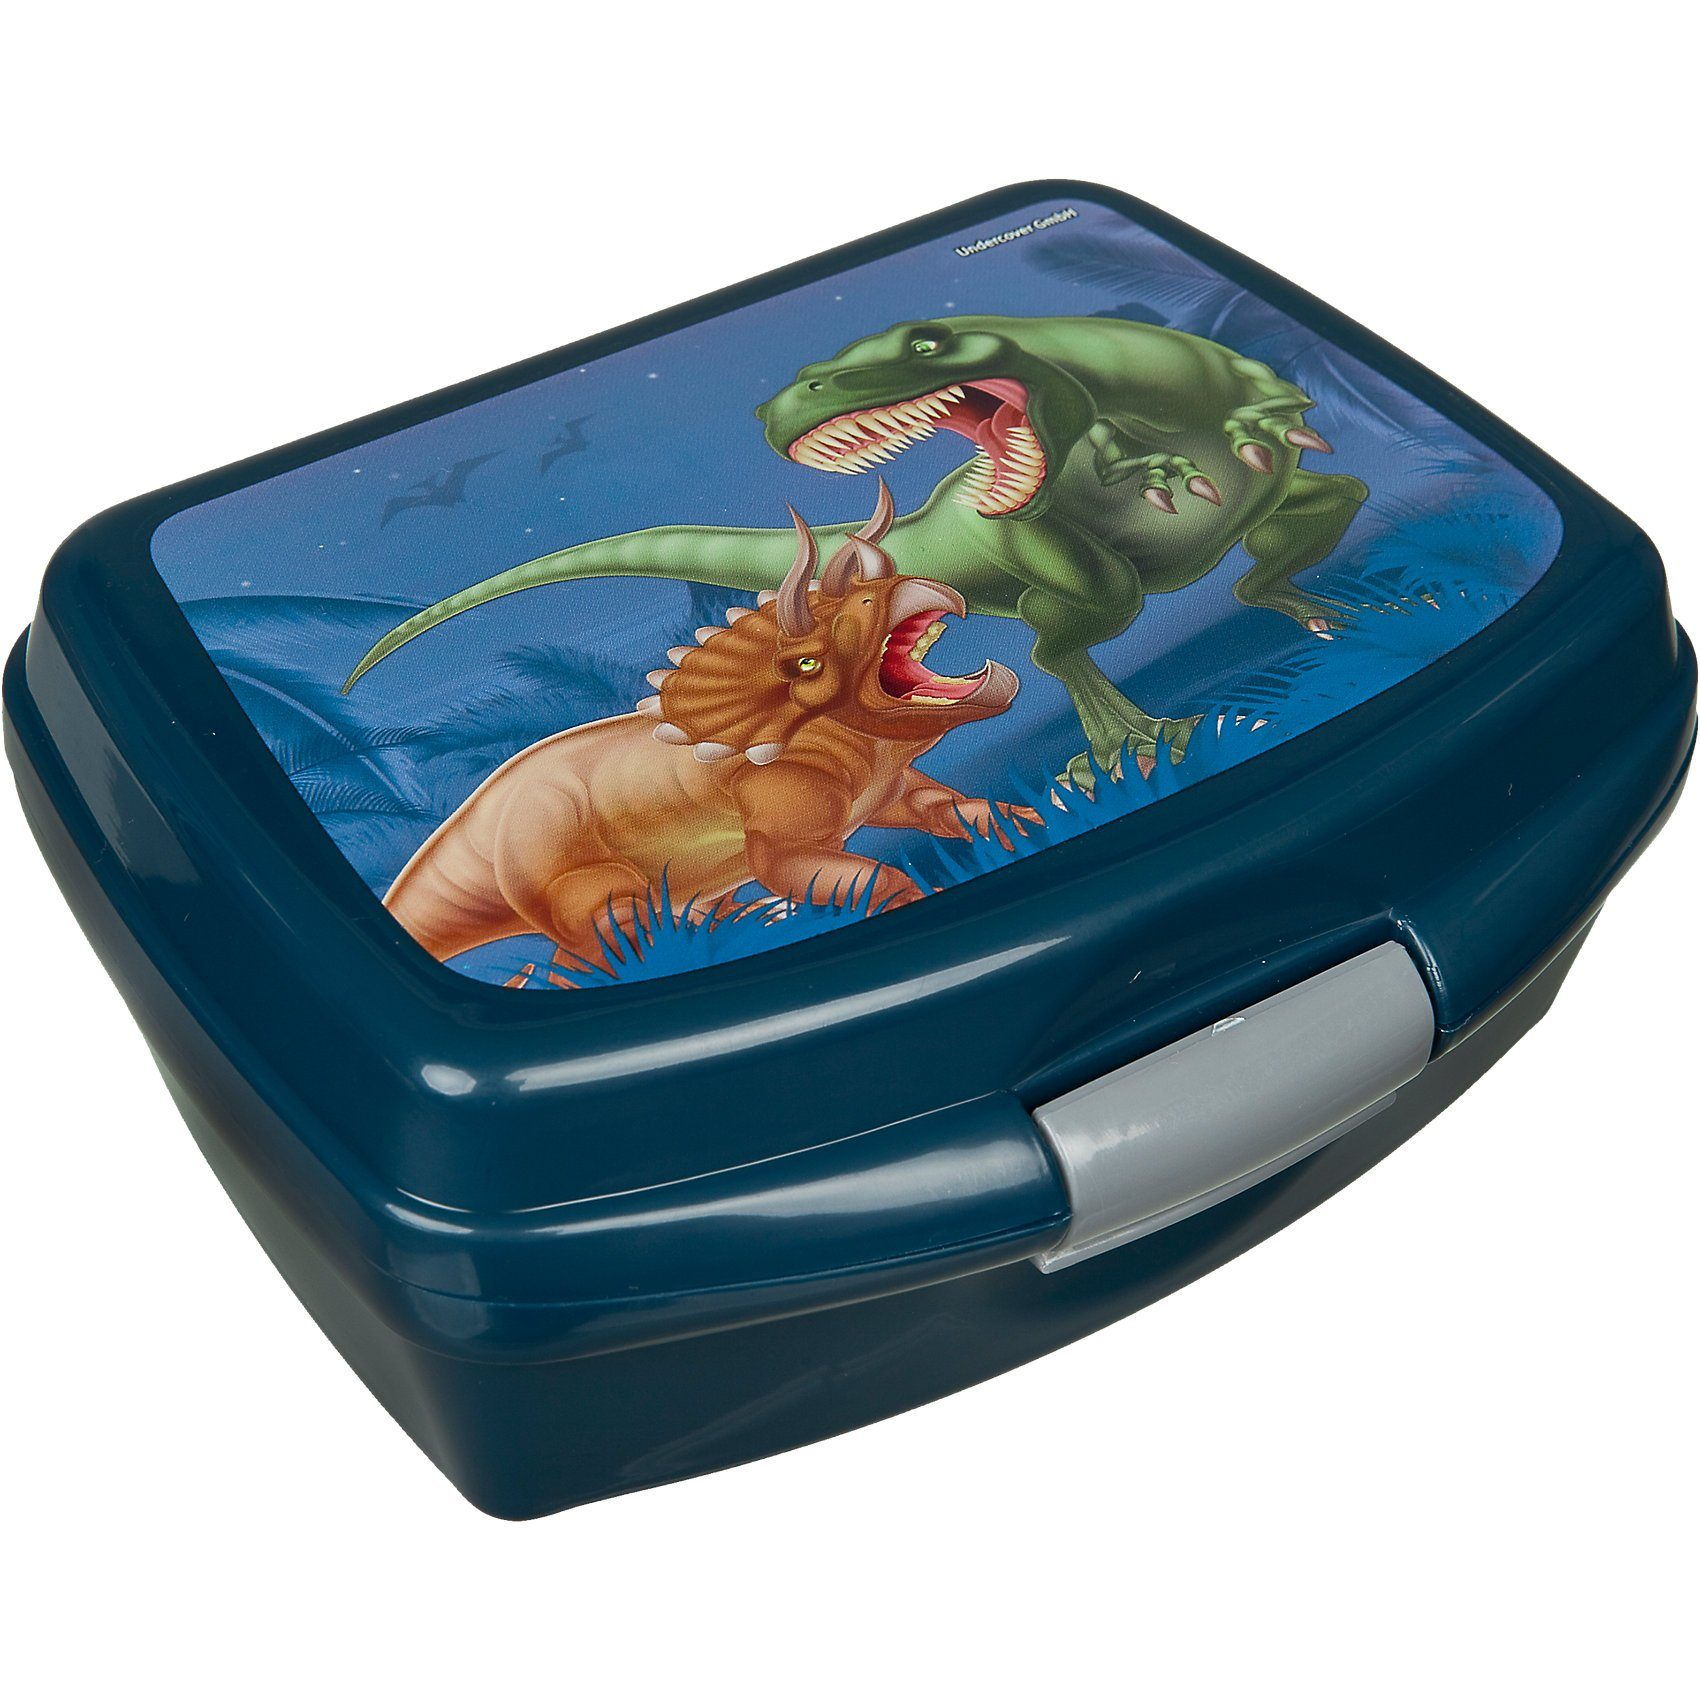 Scooli Brotdose Dinosaur Life